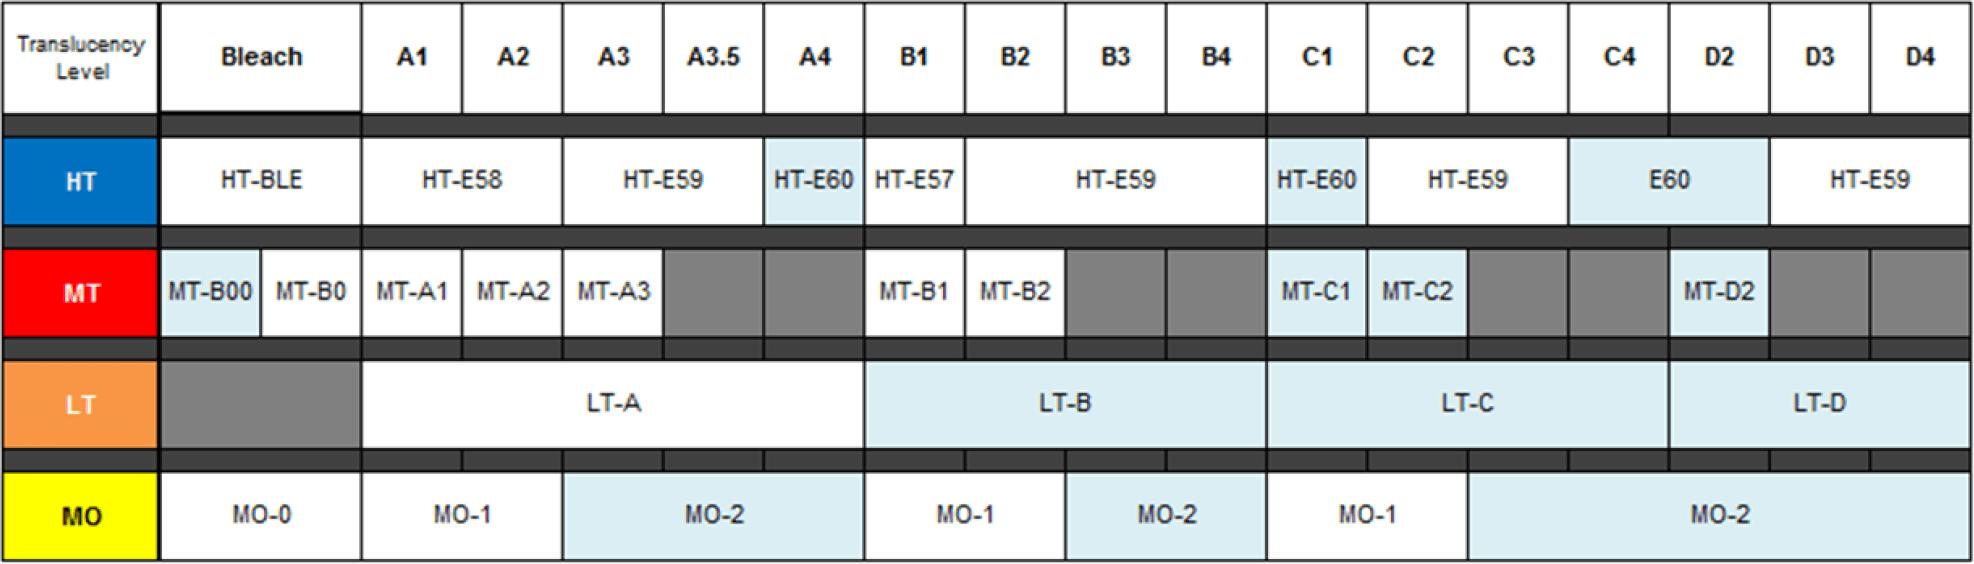 GC Initial LiSi Press LD Shade Chart